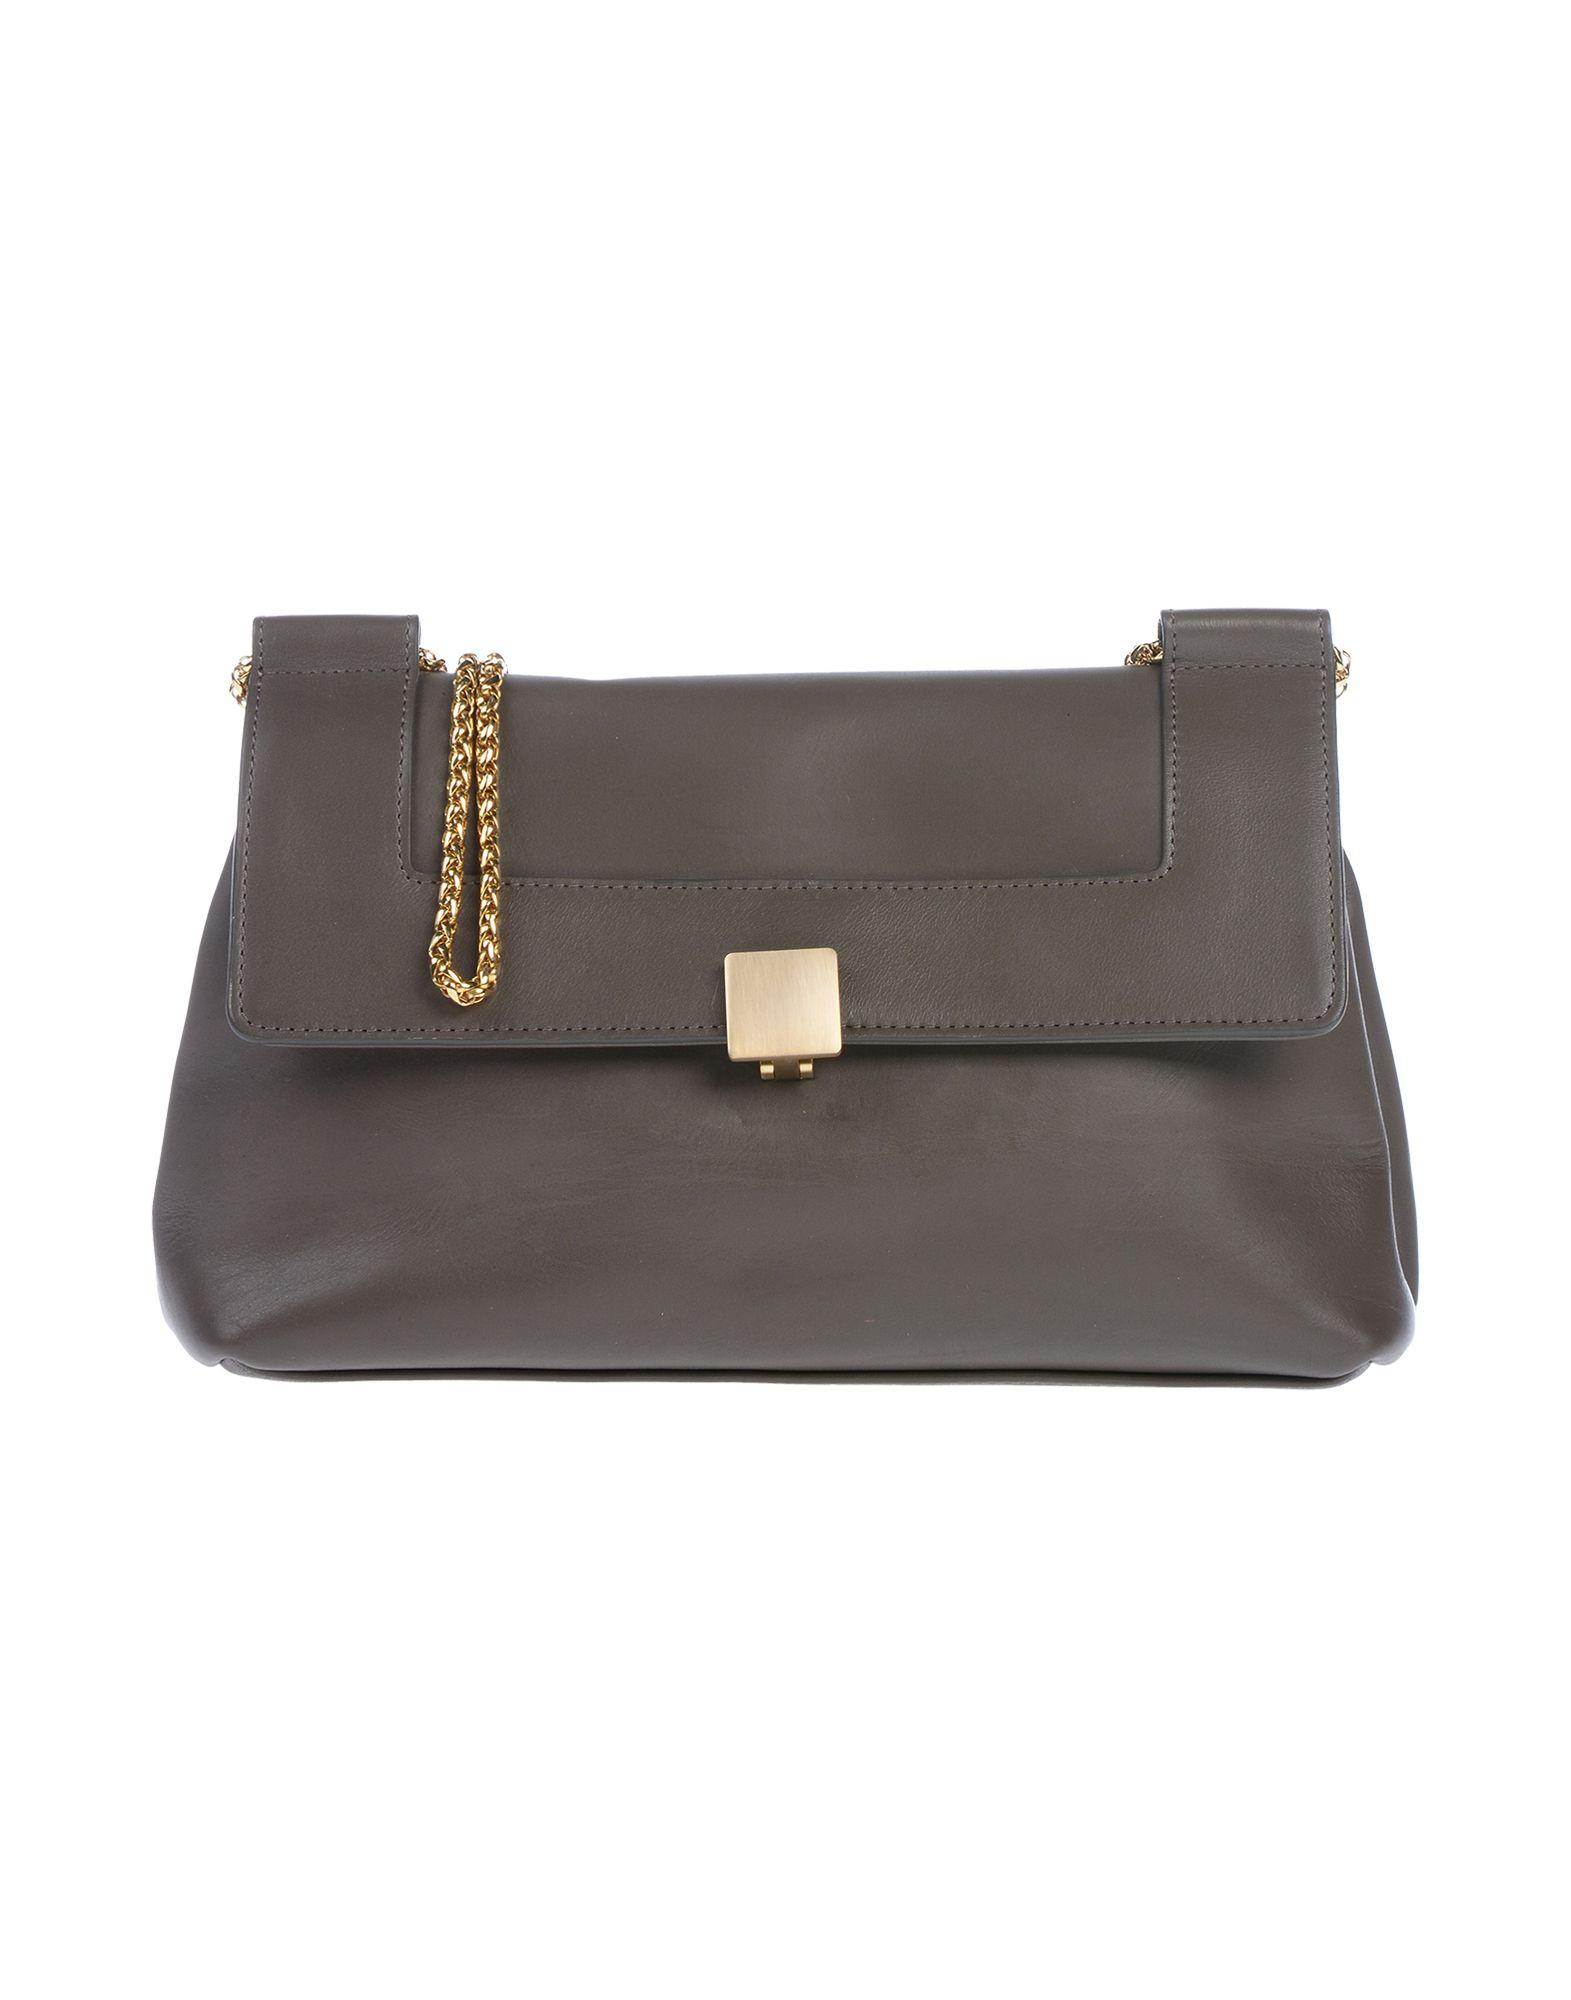 AVRIL GAU Handbags in Lead